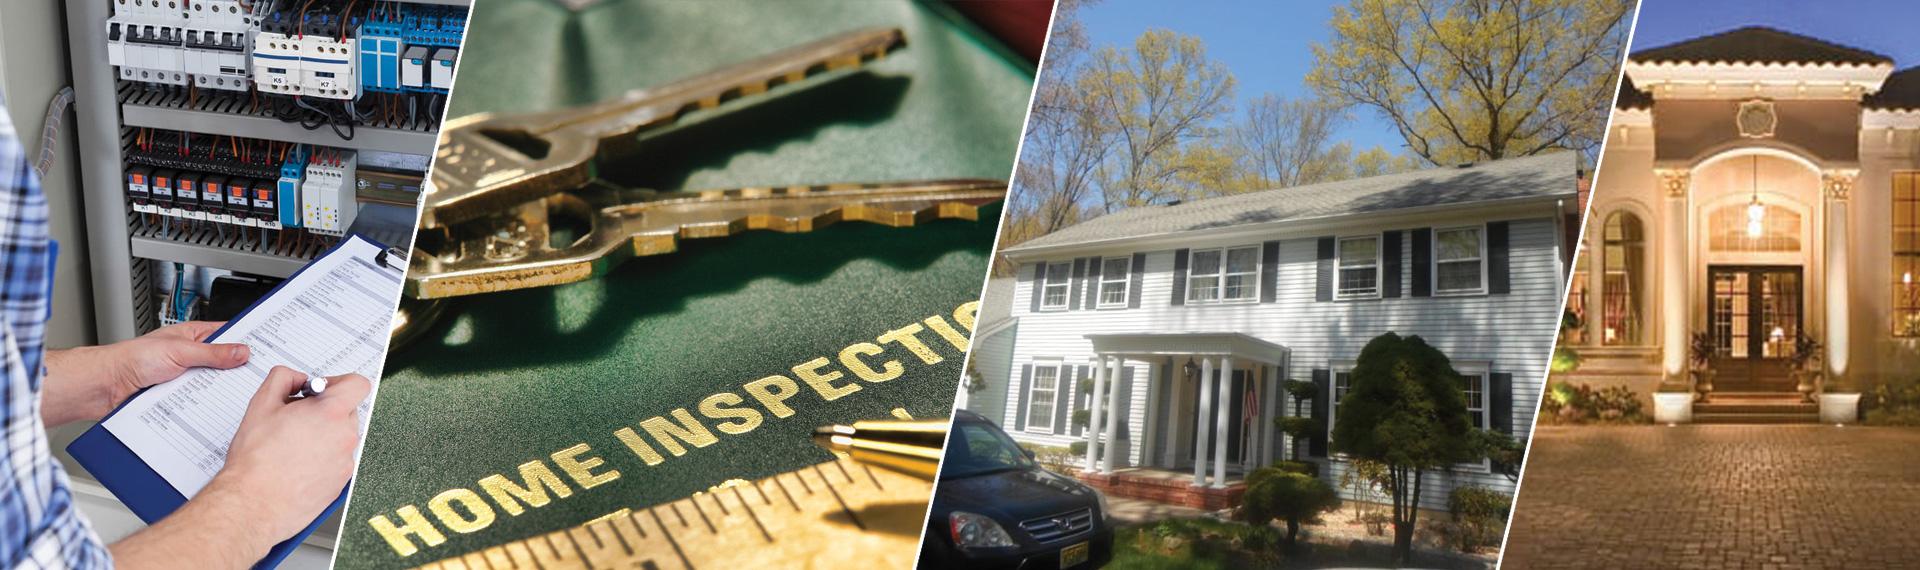 AAA House Doctors Engineers & Home Inspectors Spotswood NJ